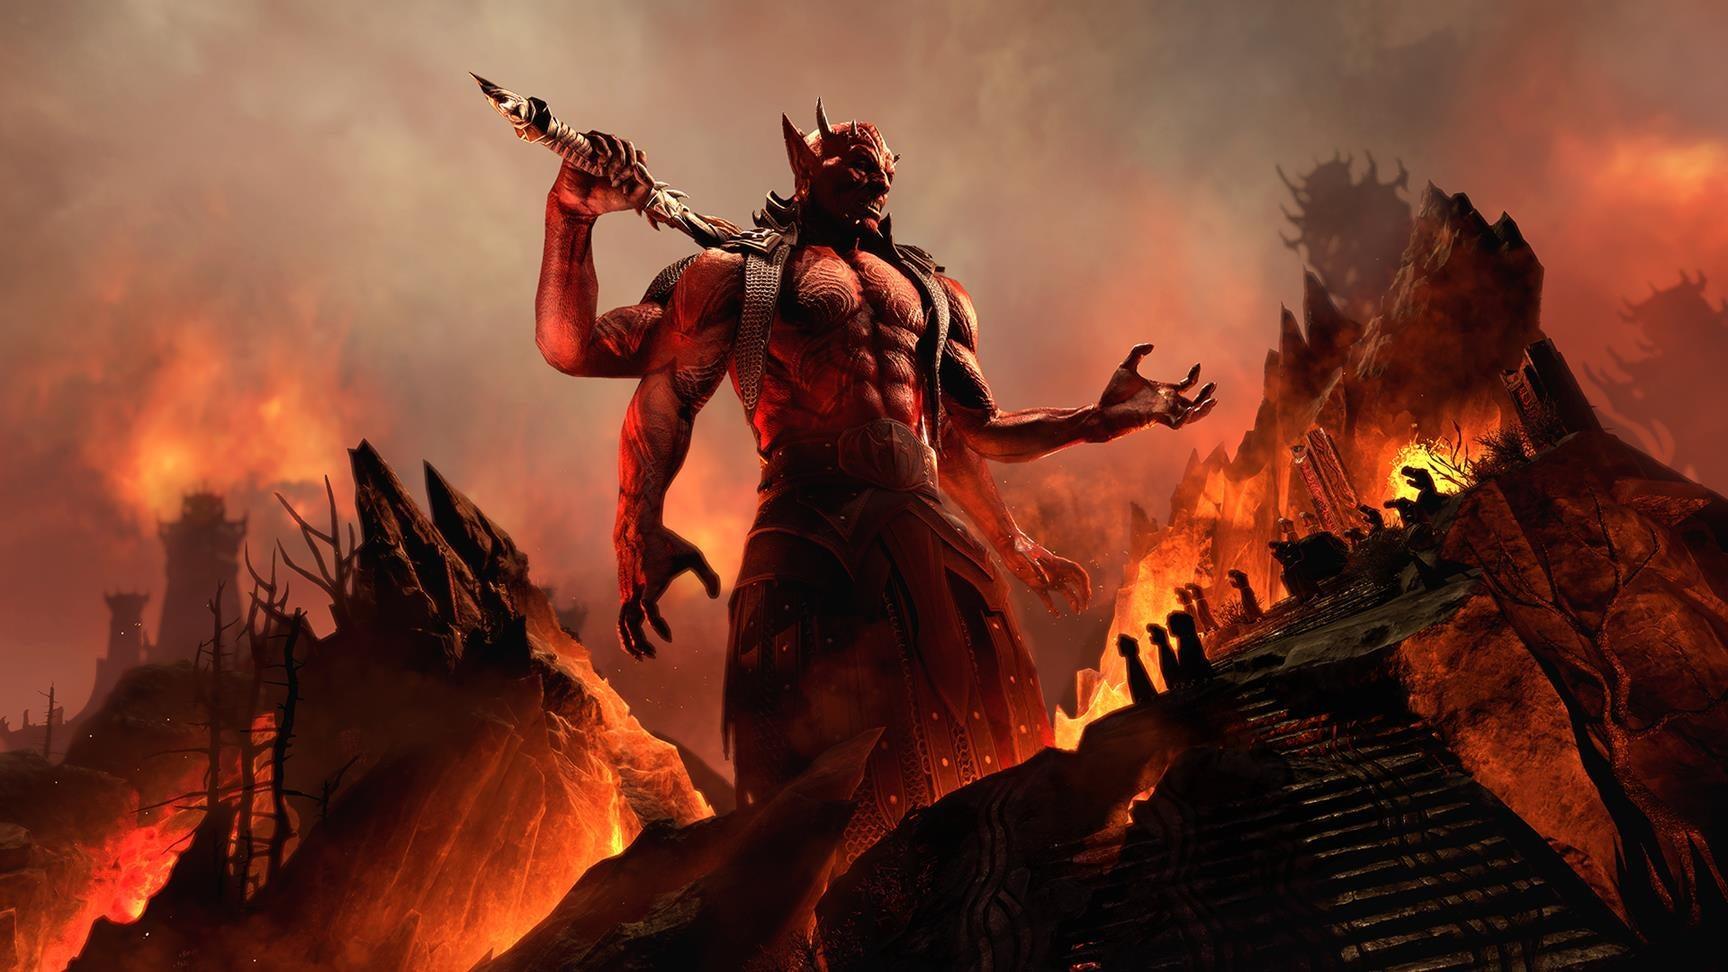 Image for New Elder Scrolls Online Blackwood story set 800 years before Oblivion